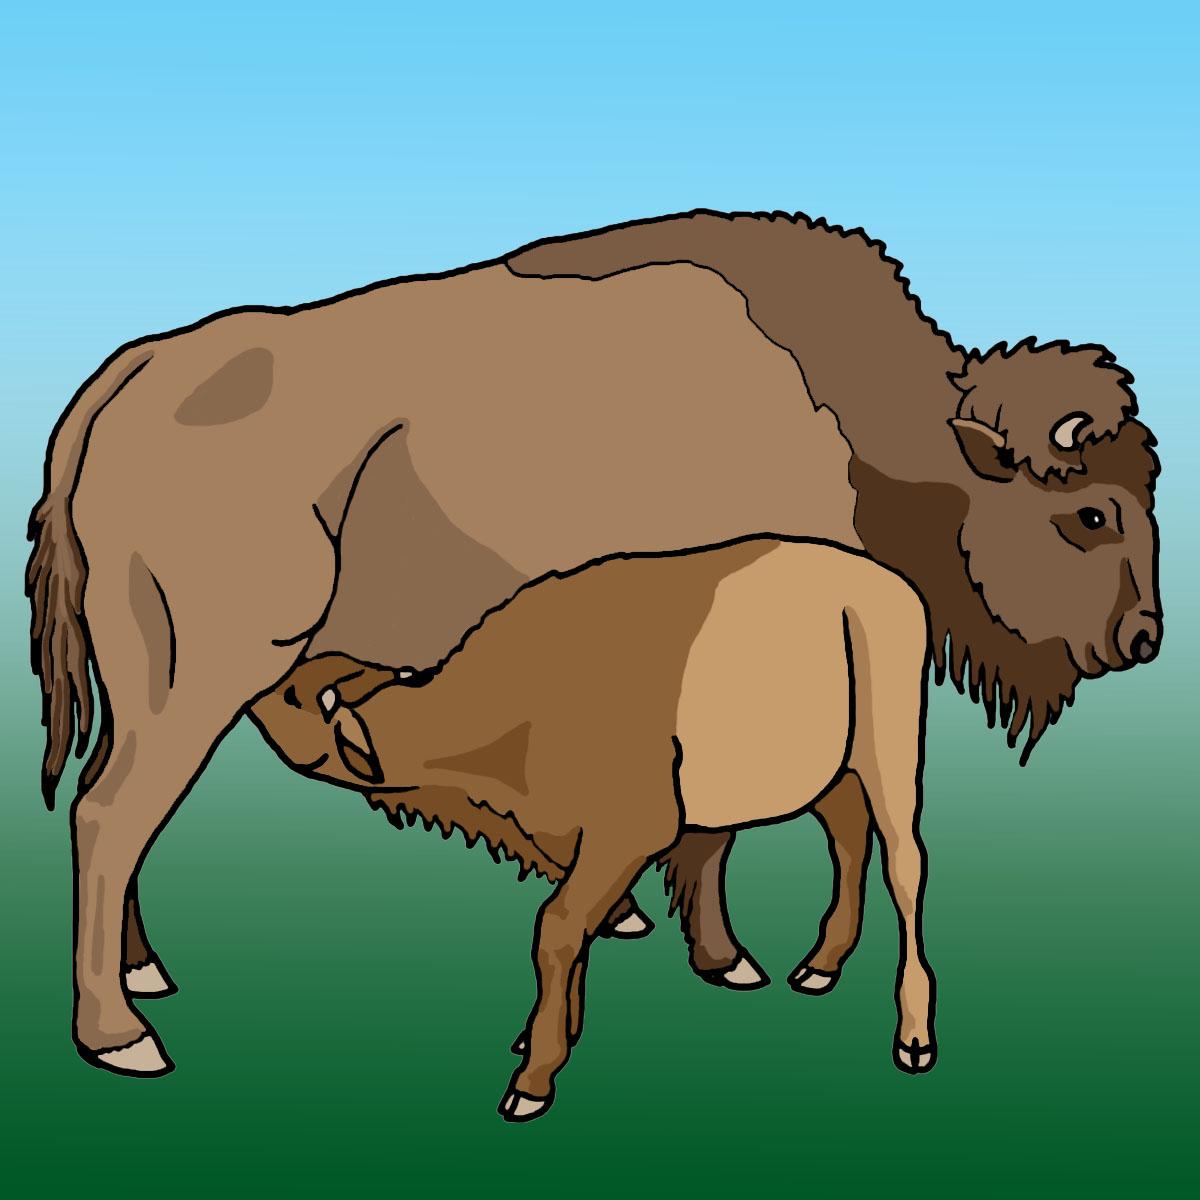 Clip art buffalo calf grayscale